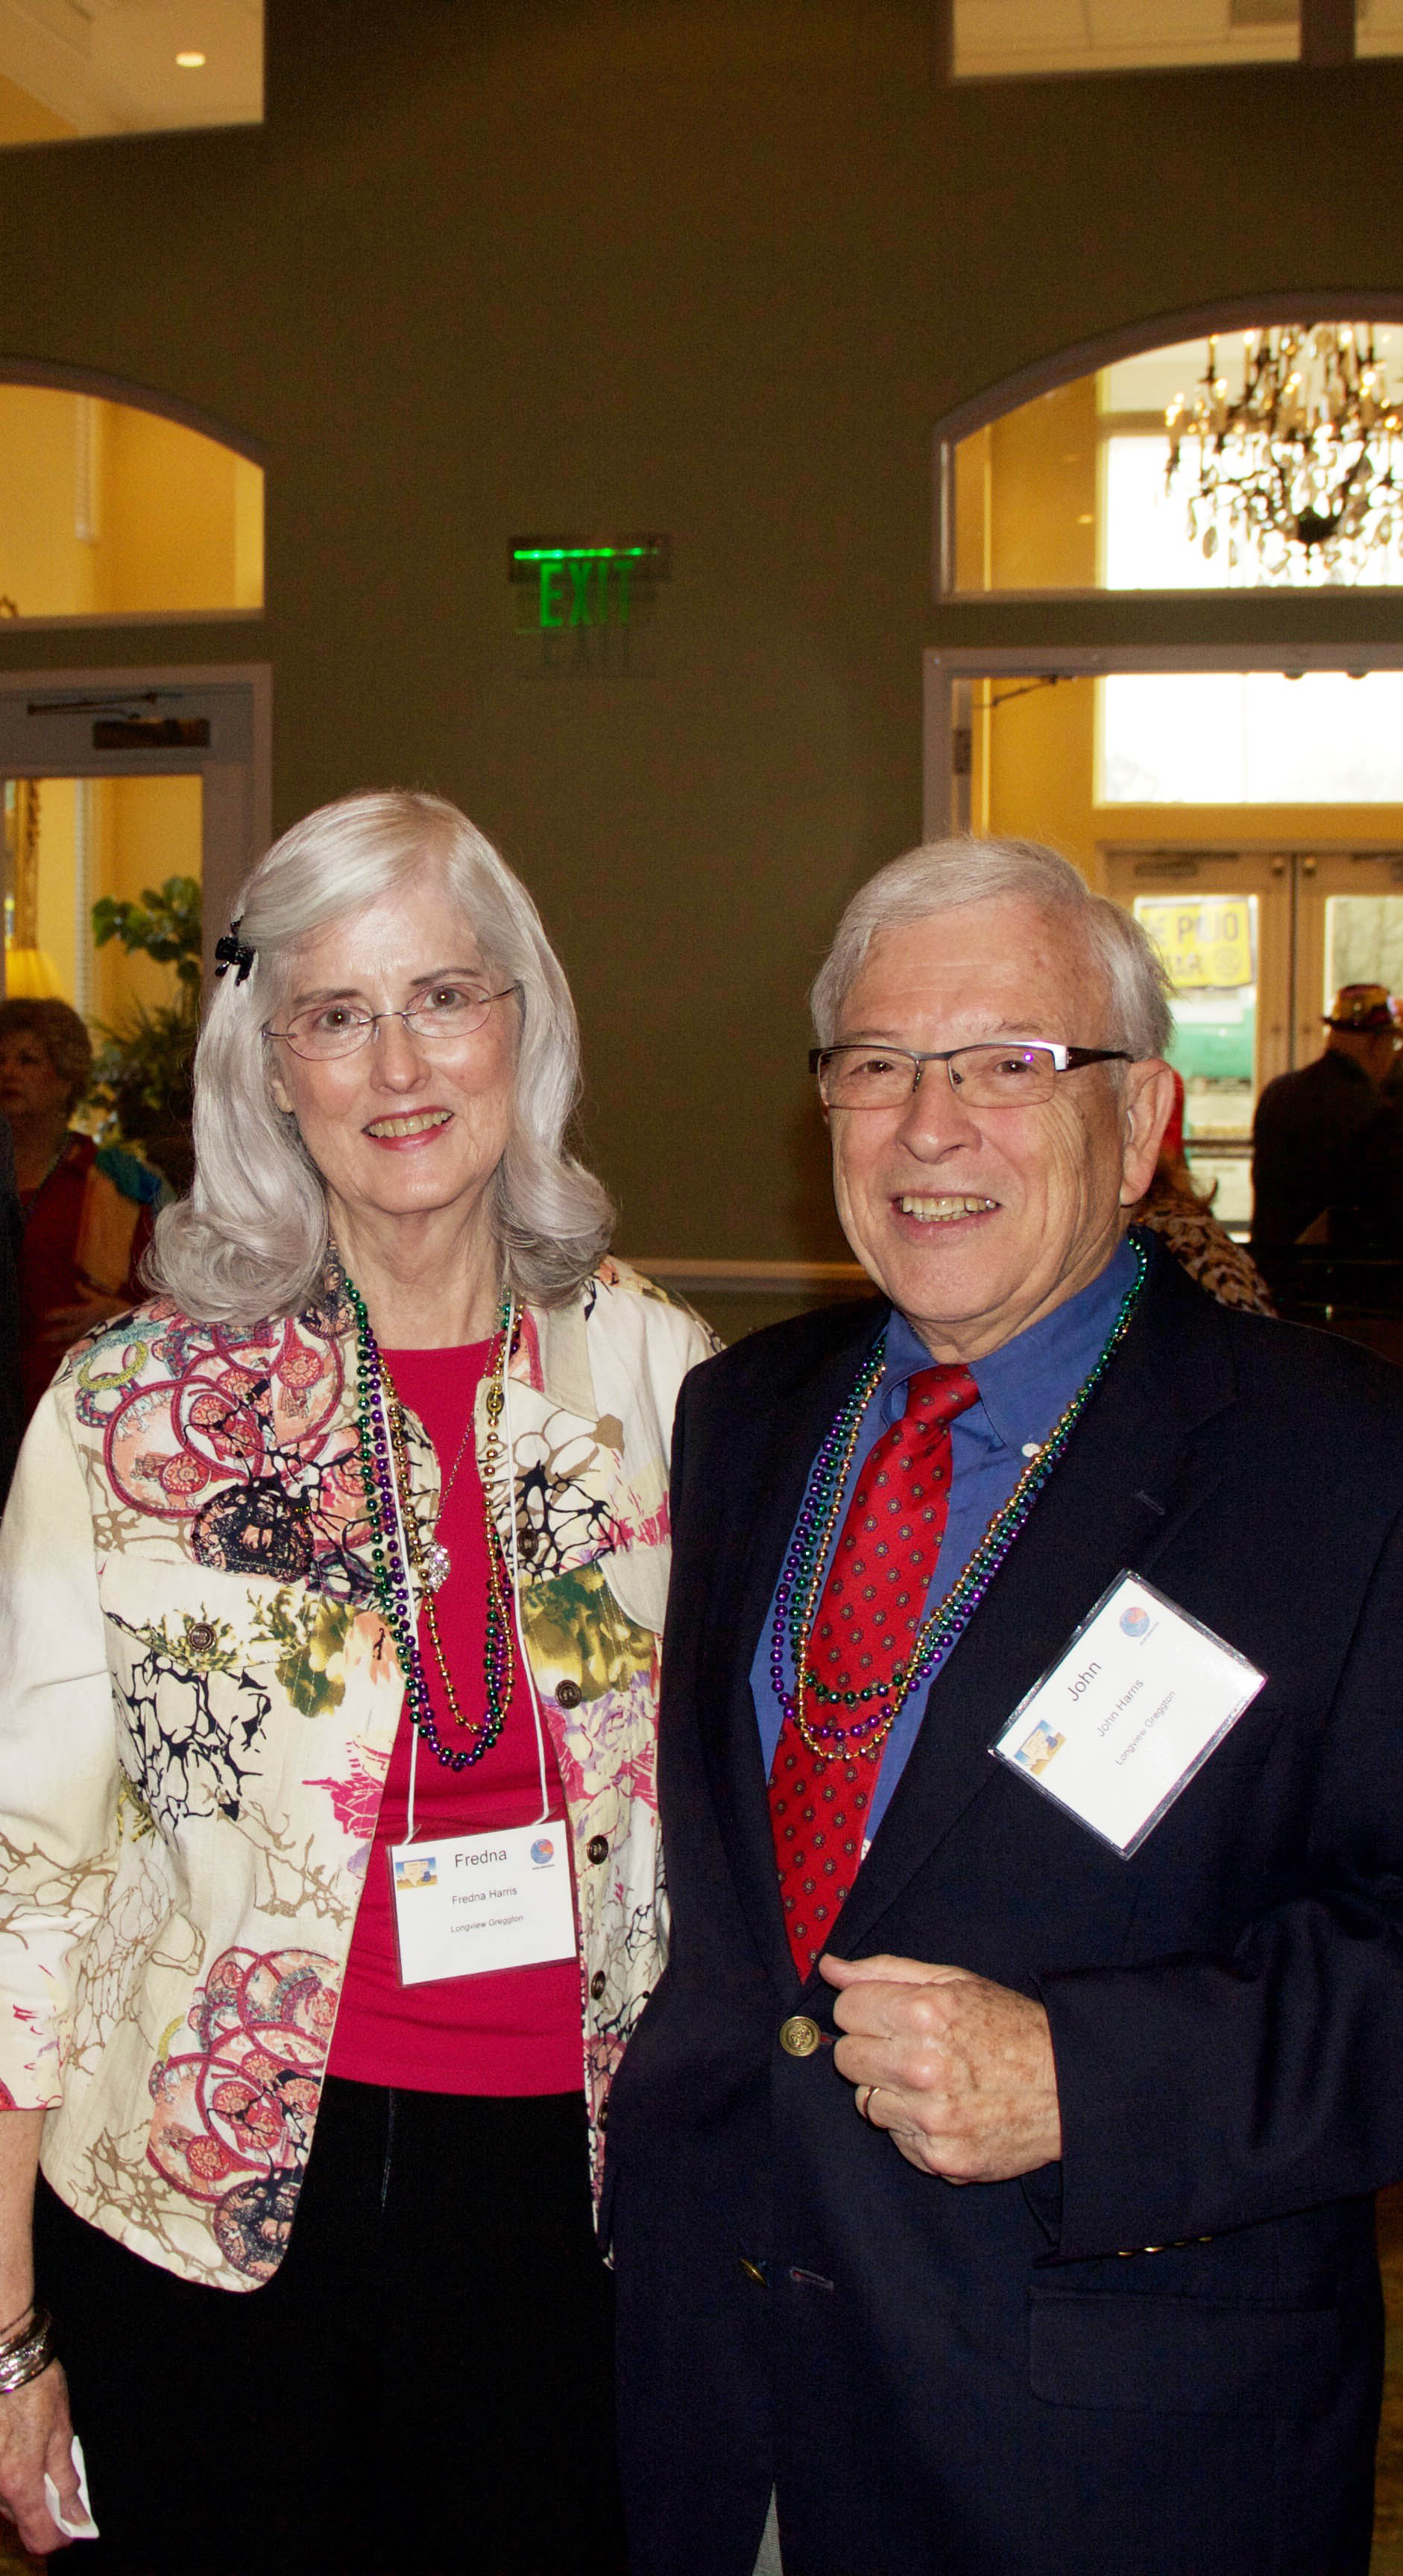 Fredna and John Harris